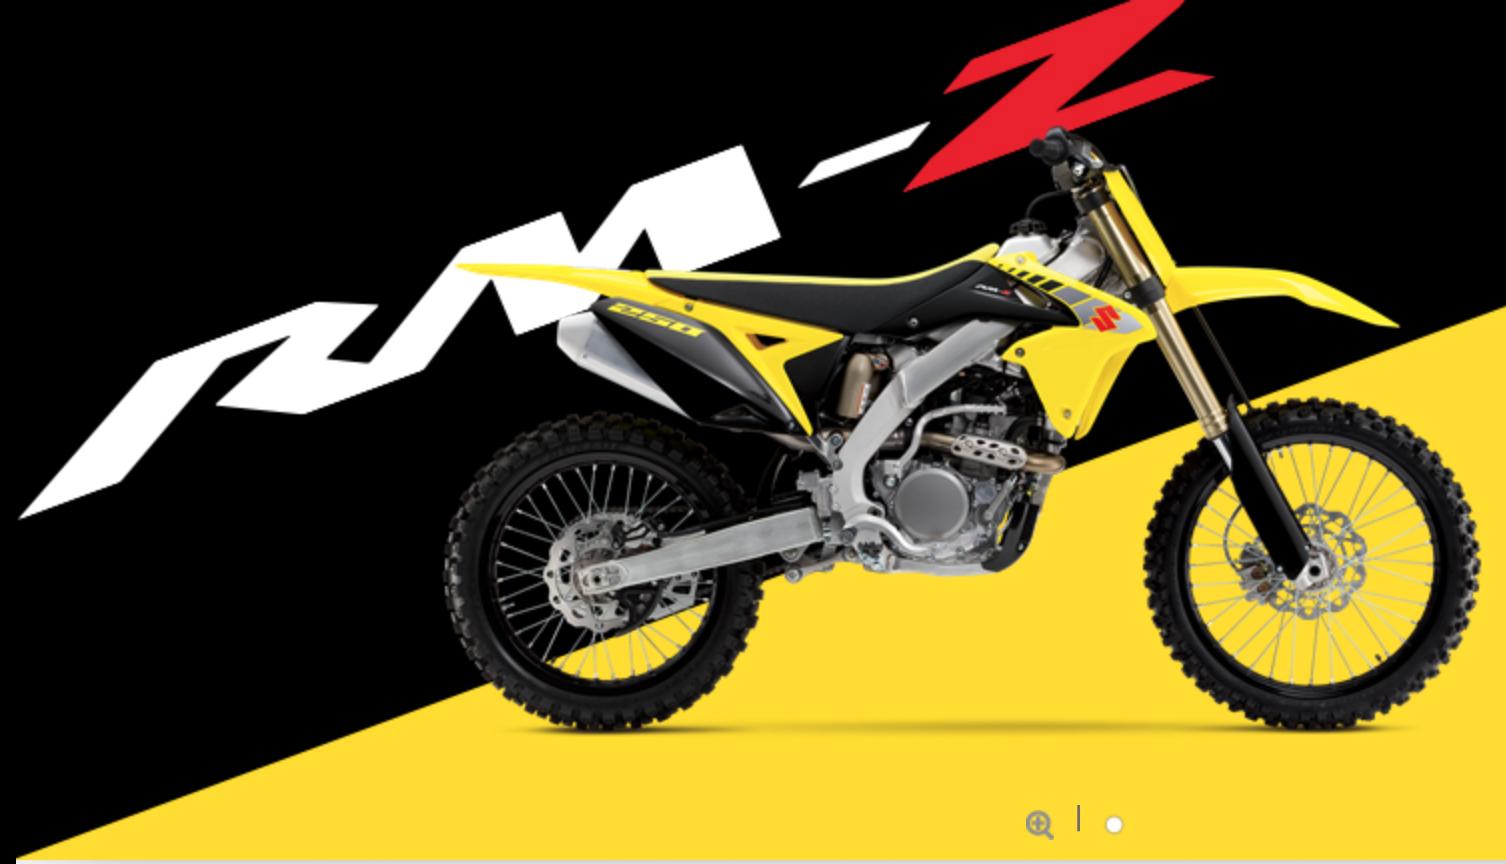 Groovy 2017 Suzukis Rmz250 450 Drzs And Dual Sport Dirt Bike Machost Co Dining Chair Design Ideas Machostcouk